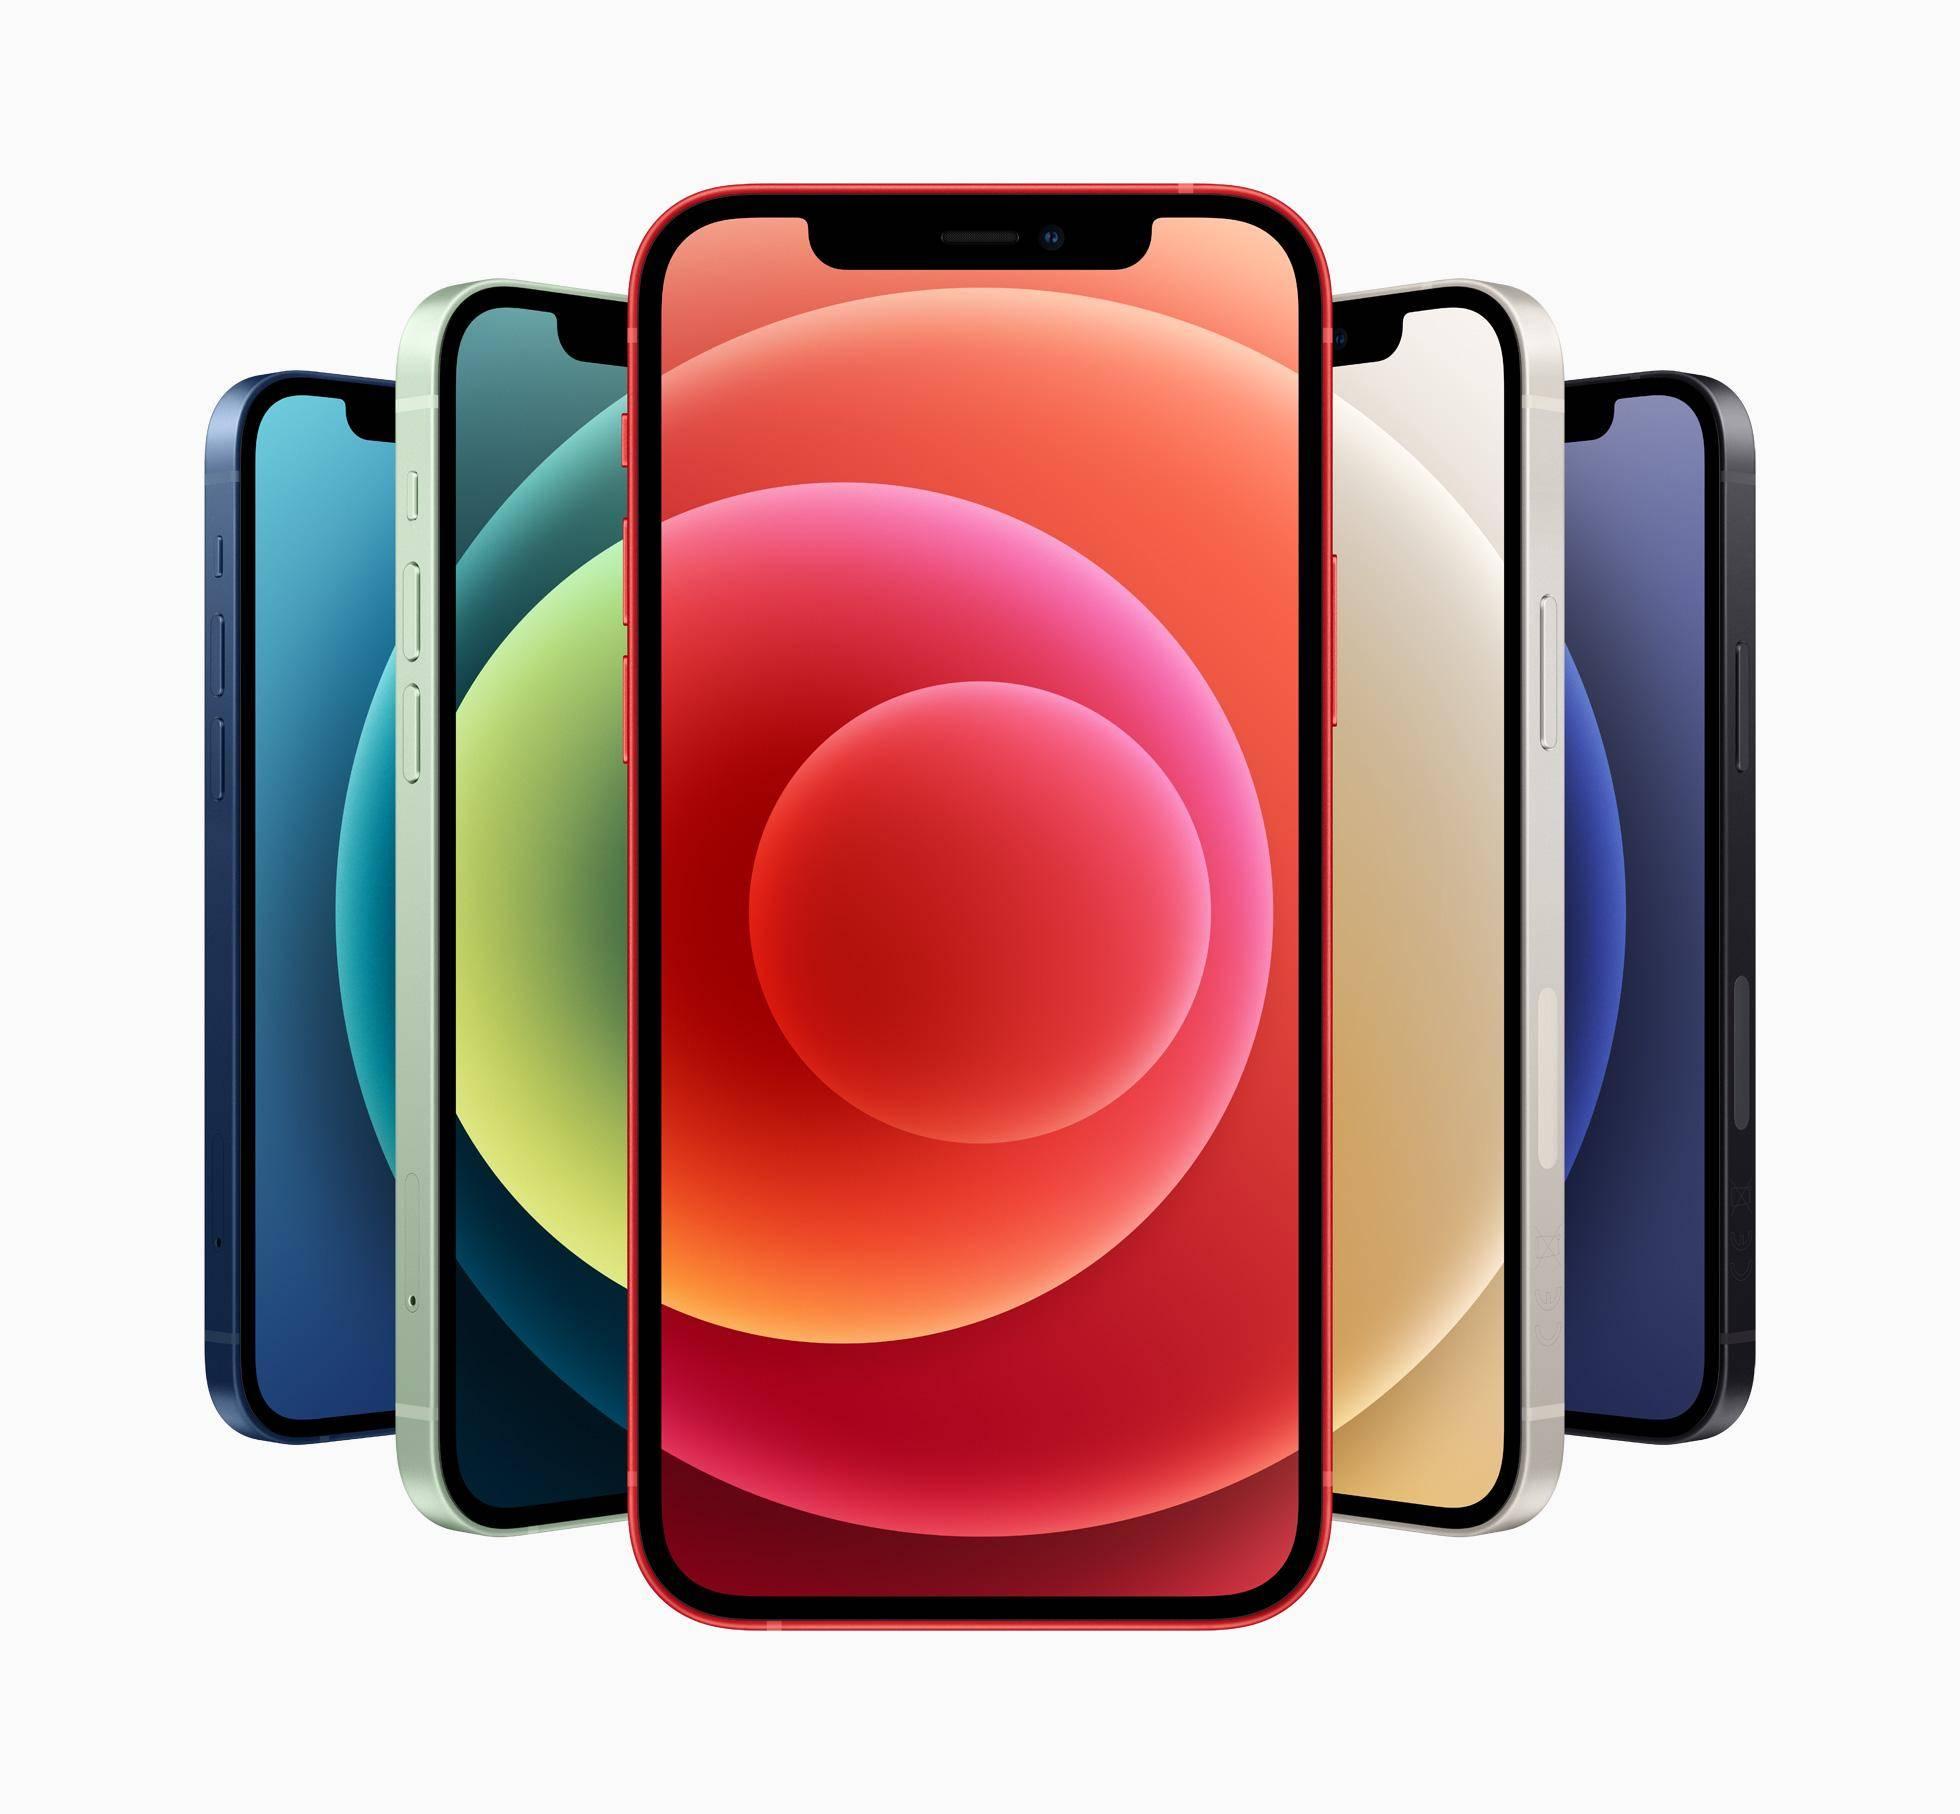 iPhone 12 系列,配件选购指南:充电器、手机壳怎么买?